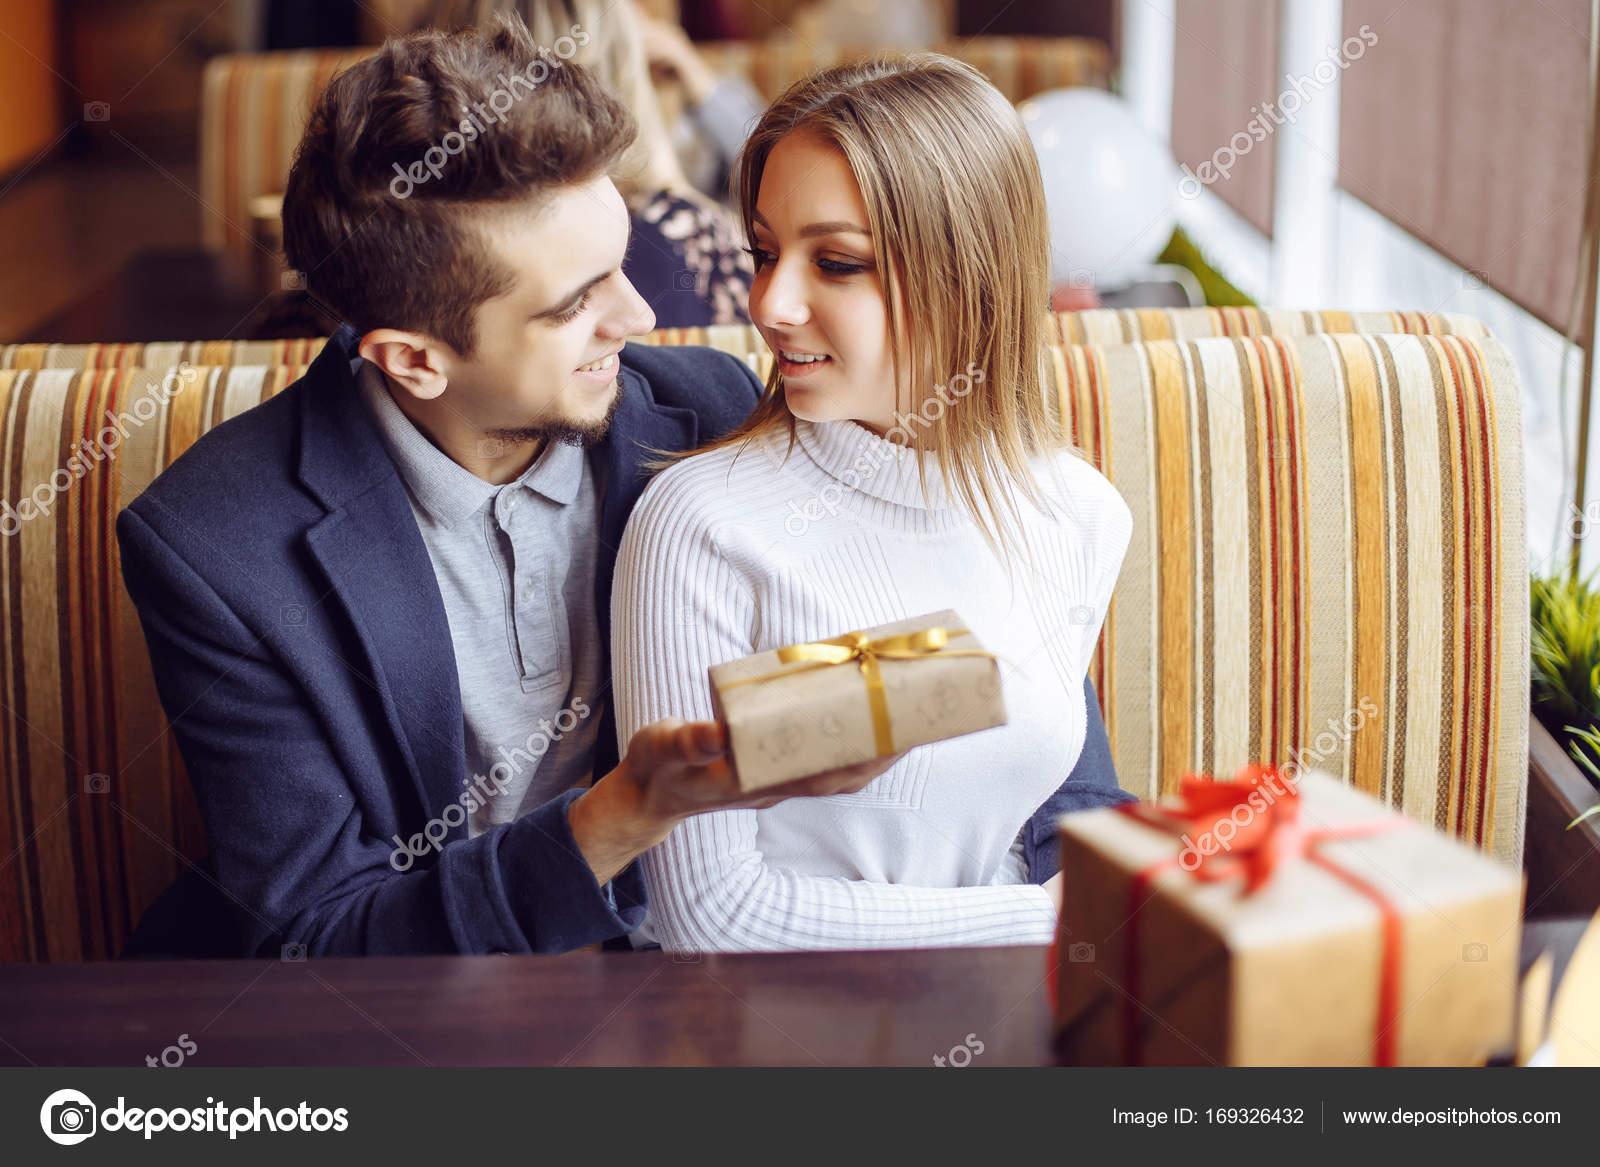 cadeau voor man dating Black Ops 2 skill gebaseerd matchmaking